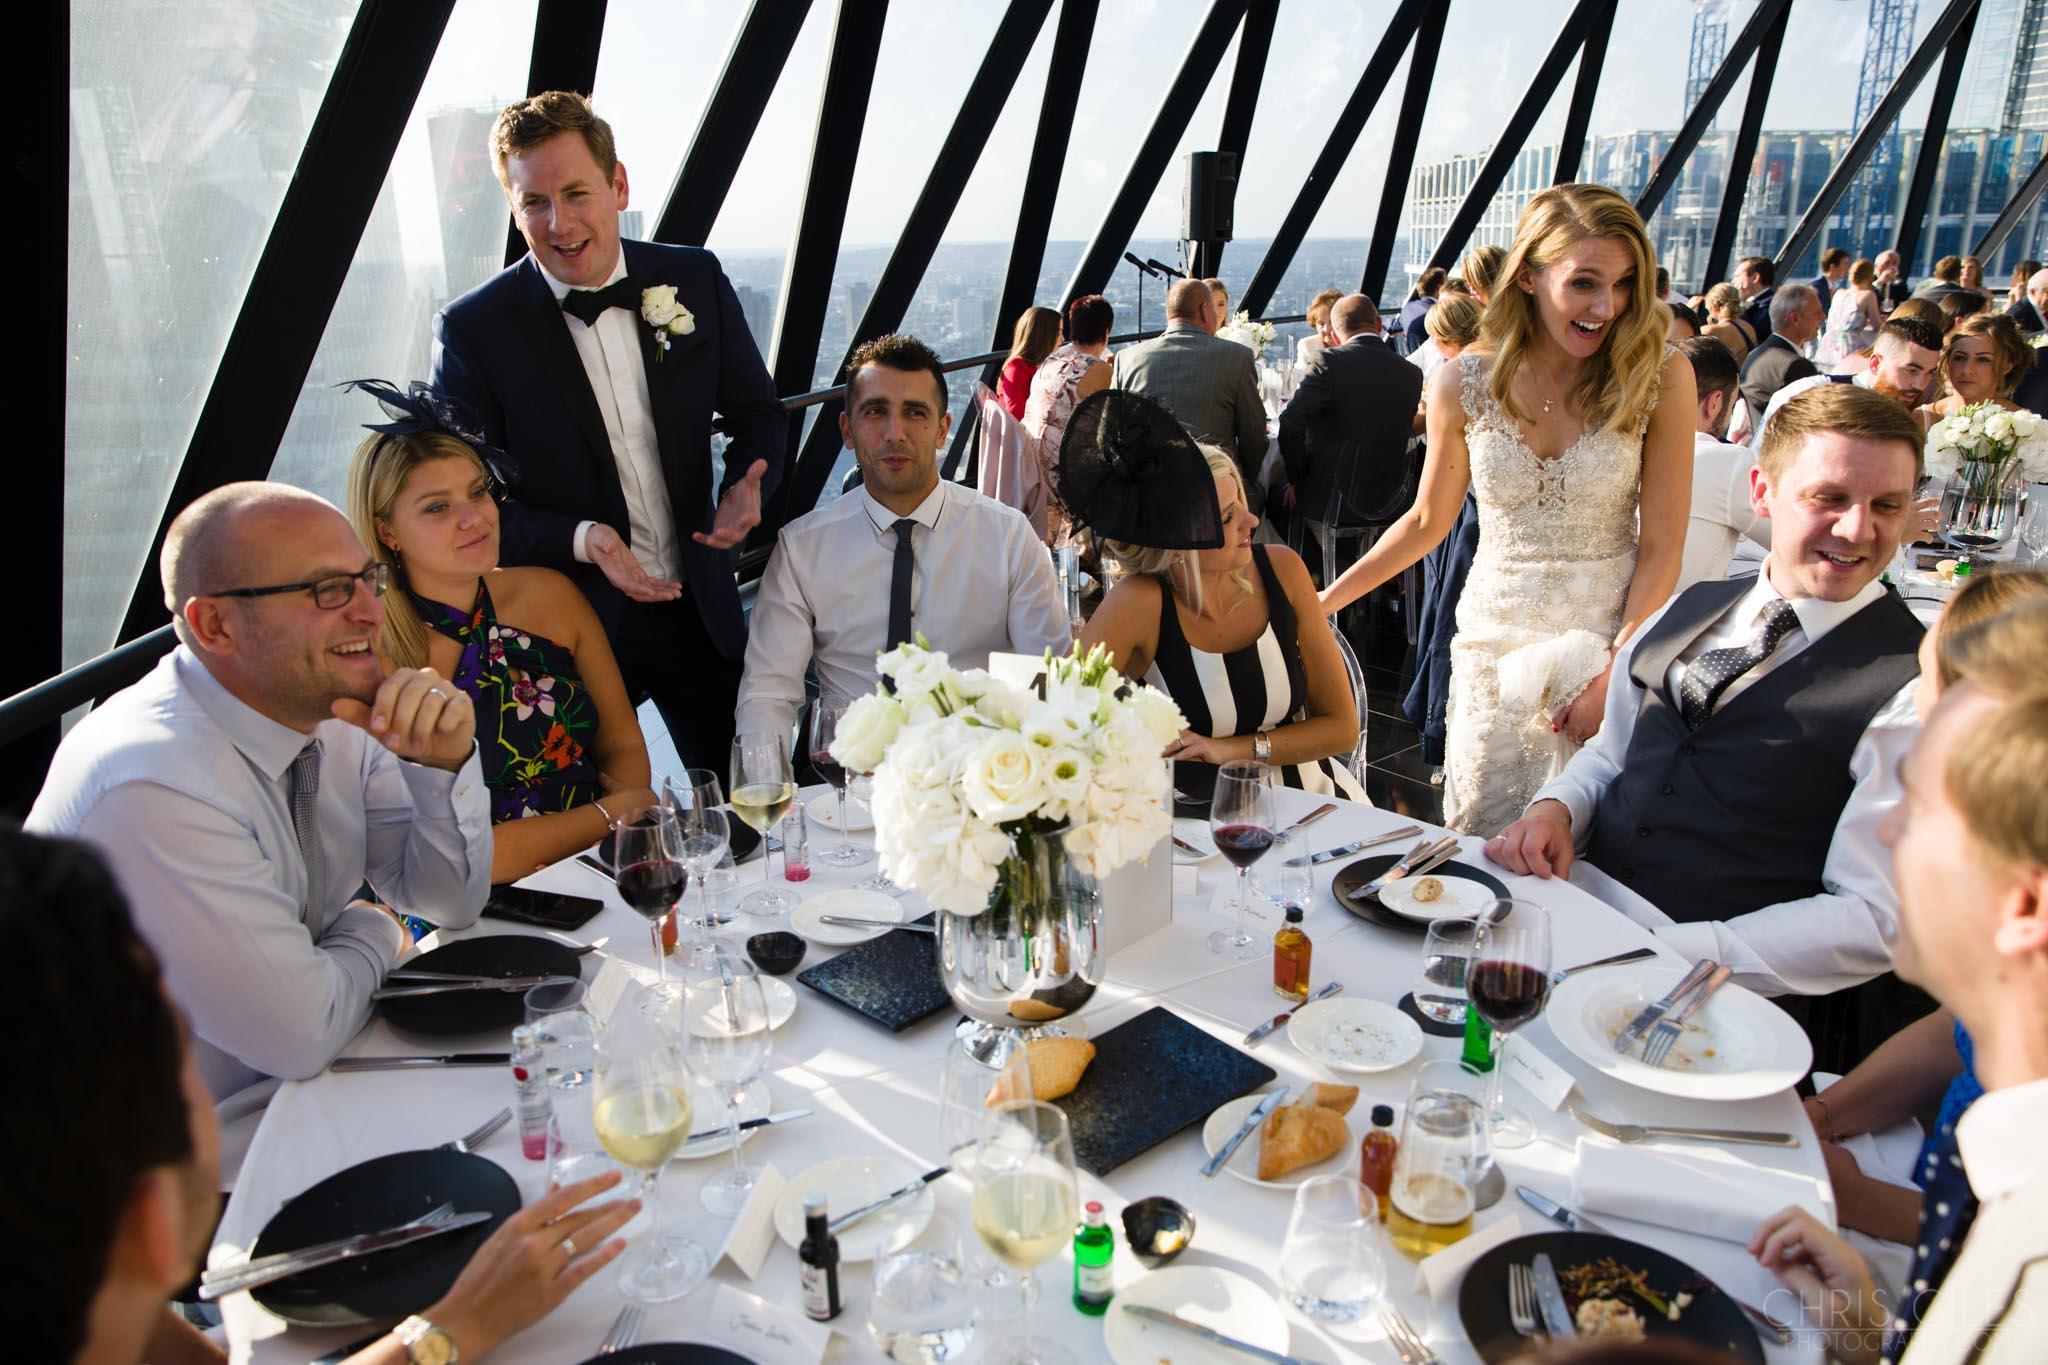 Wedding reception at The Gherkin London, dining room, wedding breakfast